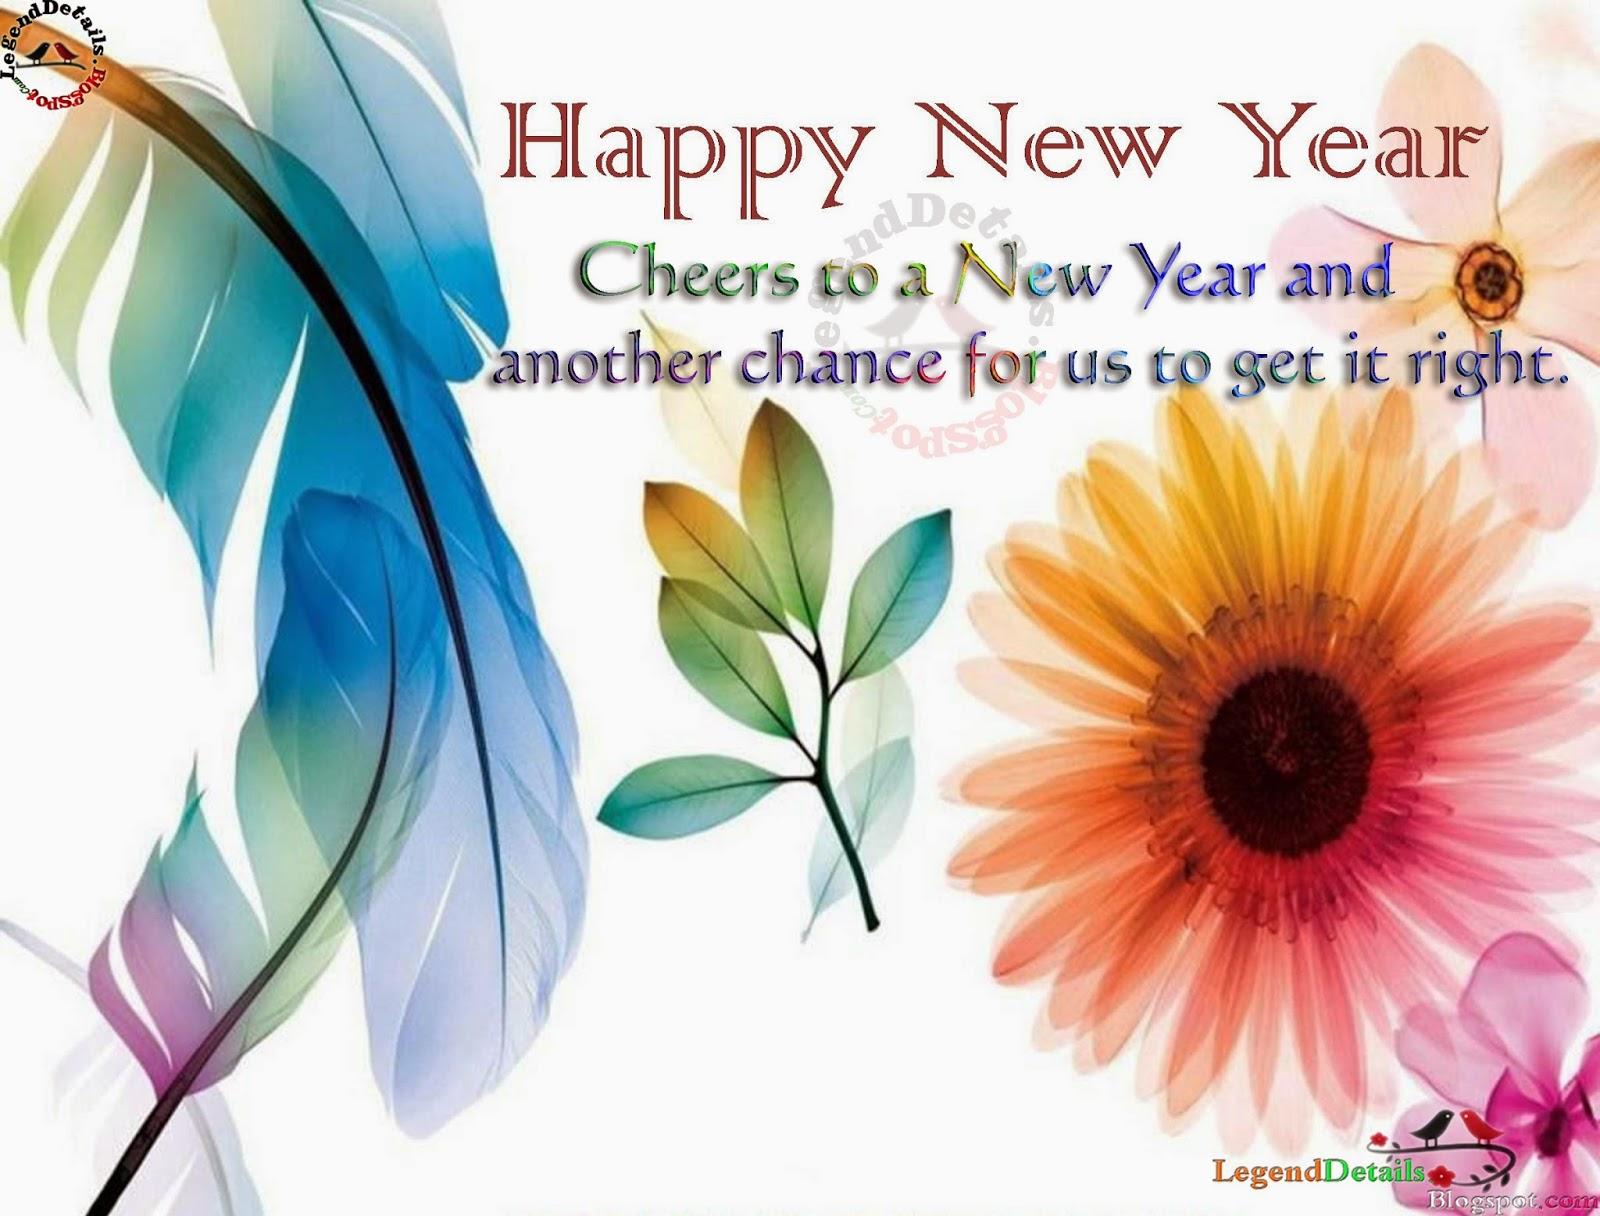 Telugu new year greetings 2015 telugu happy new year wallpapers new year greetings 2015 happy new year wallpapers 2015 hd new year quotes sms m4hsunfo